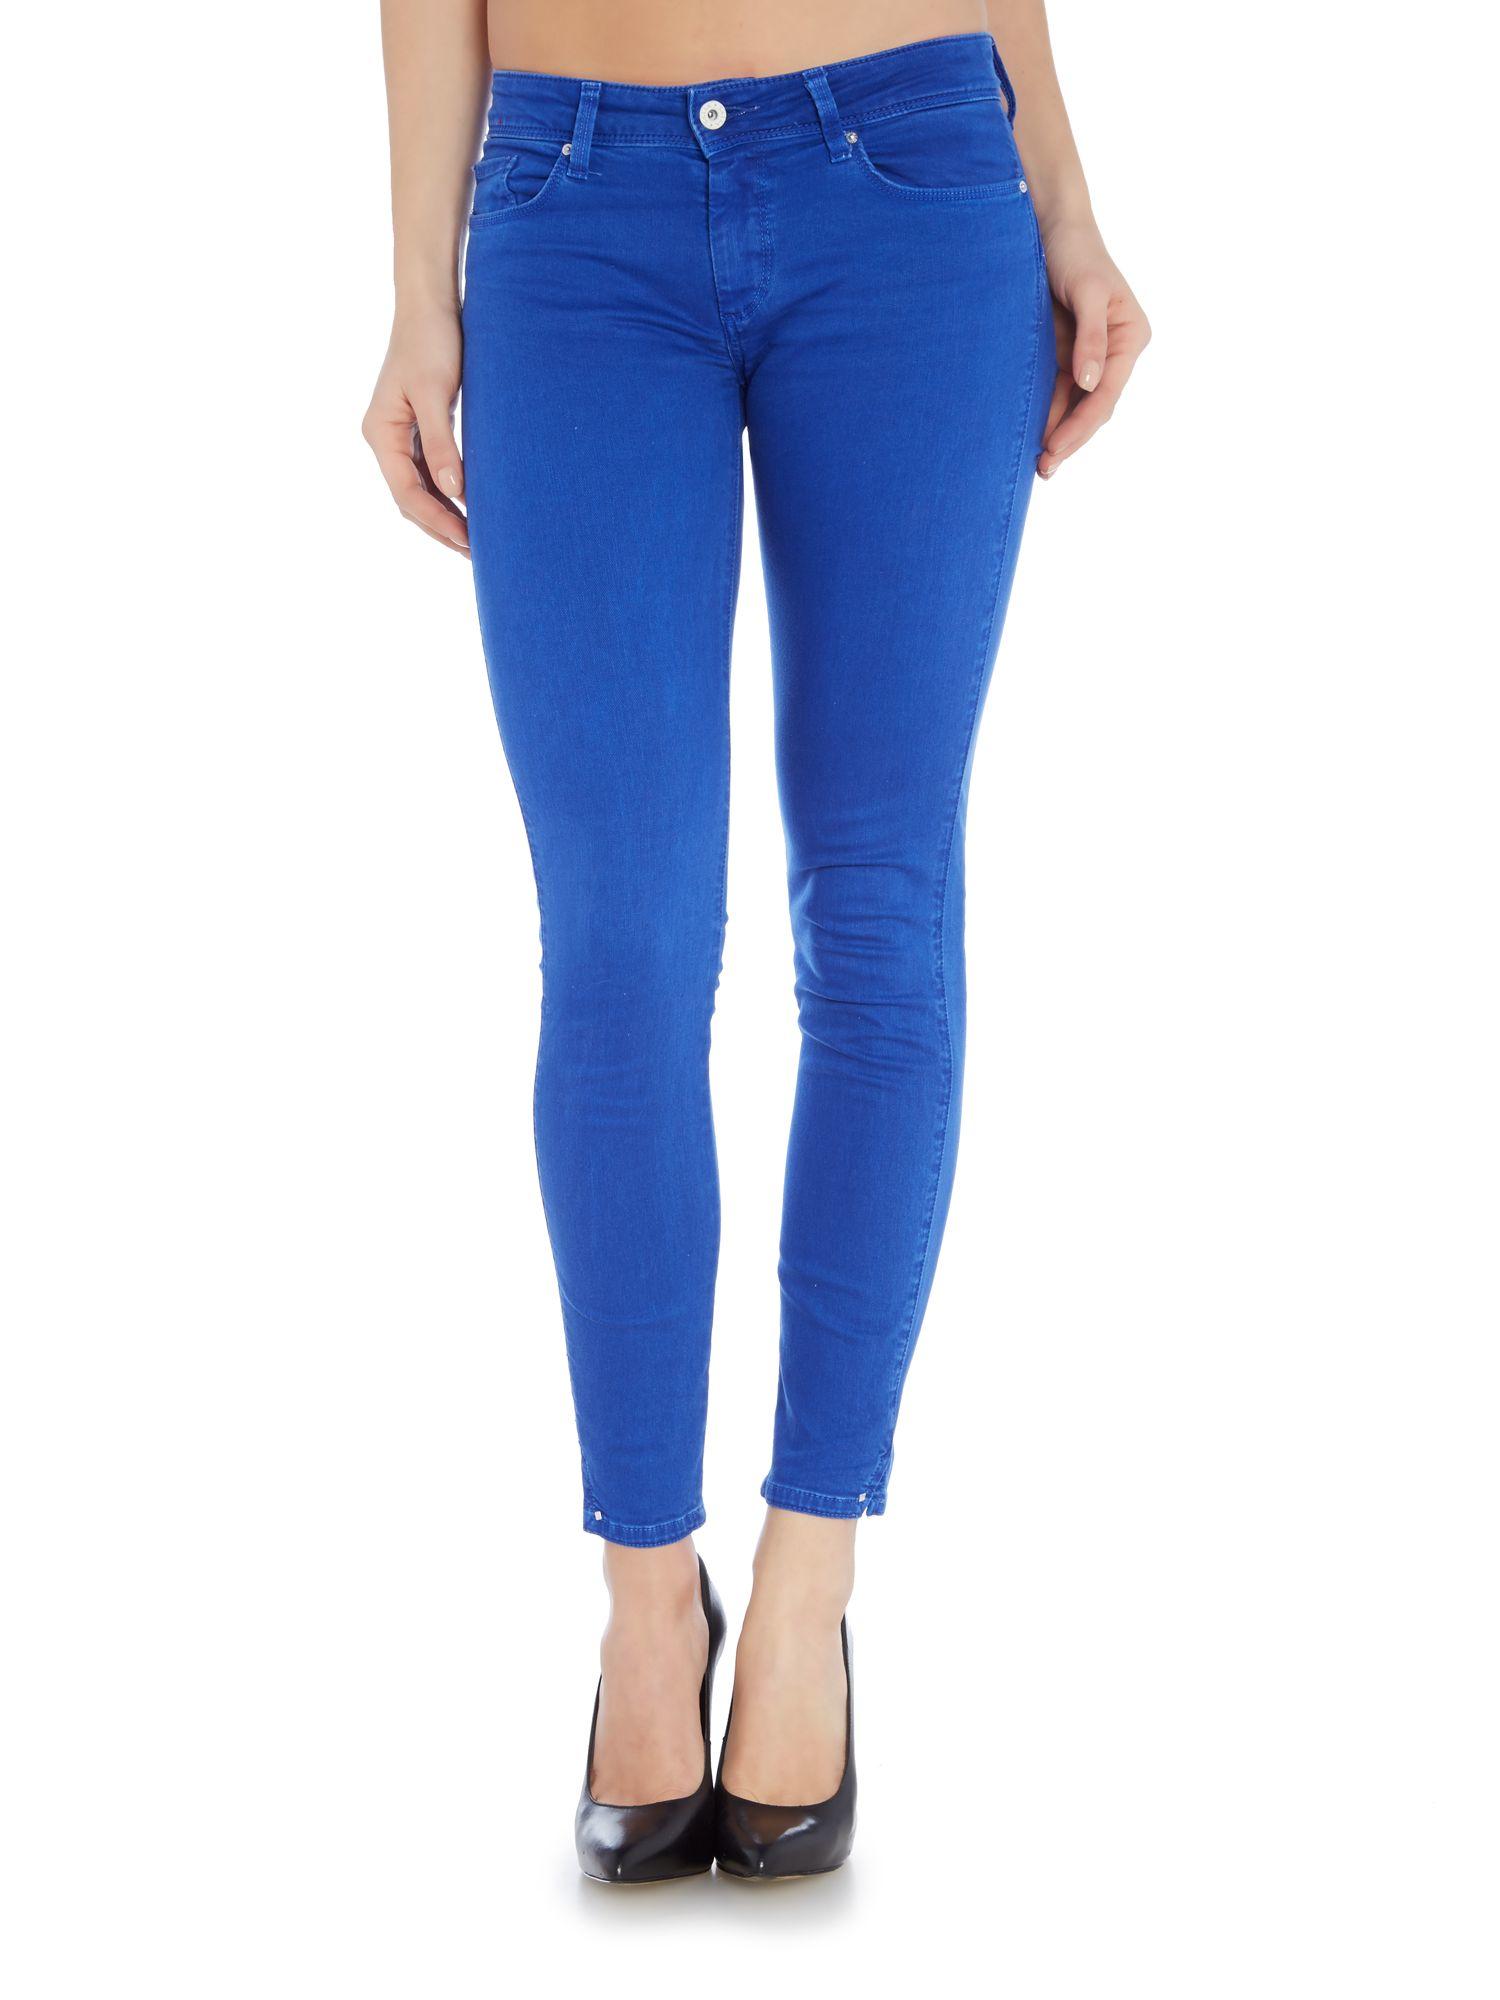 salsa wonder push up mid rise capri jeans in blue lyst. Black Bedroom Furniture Sets. Home Design Ideas